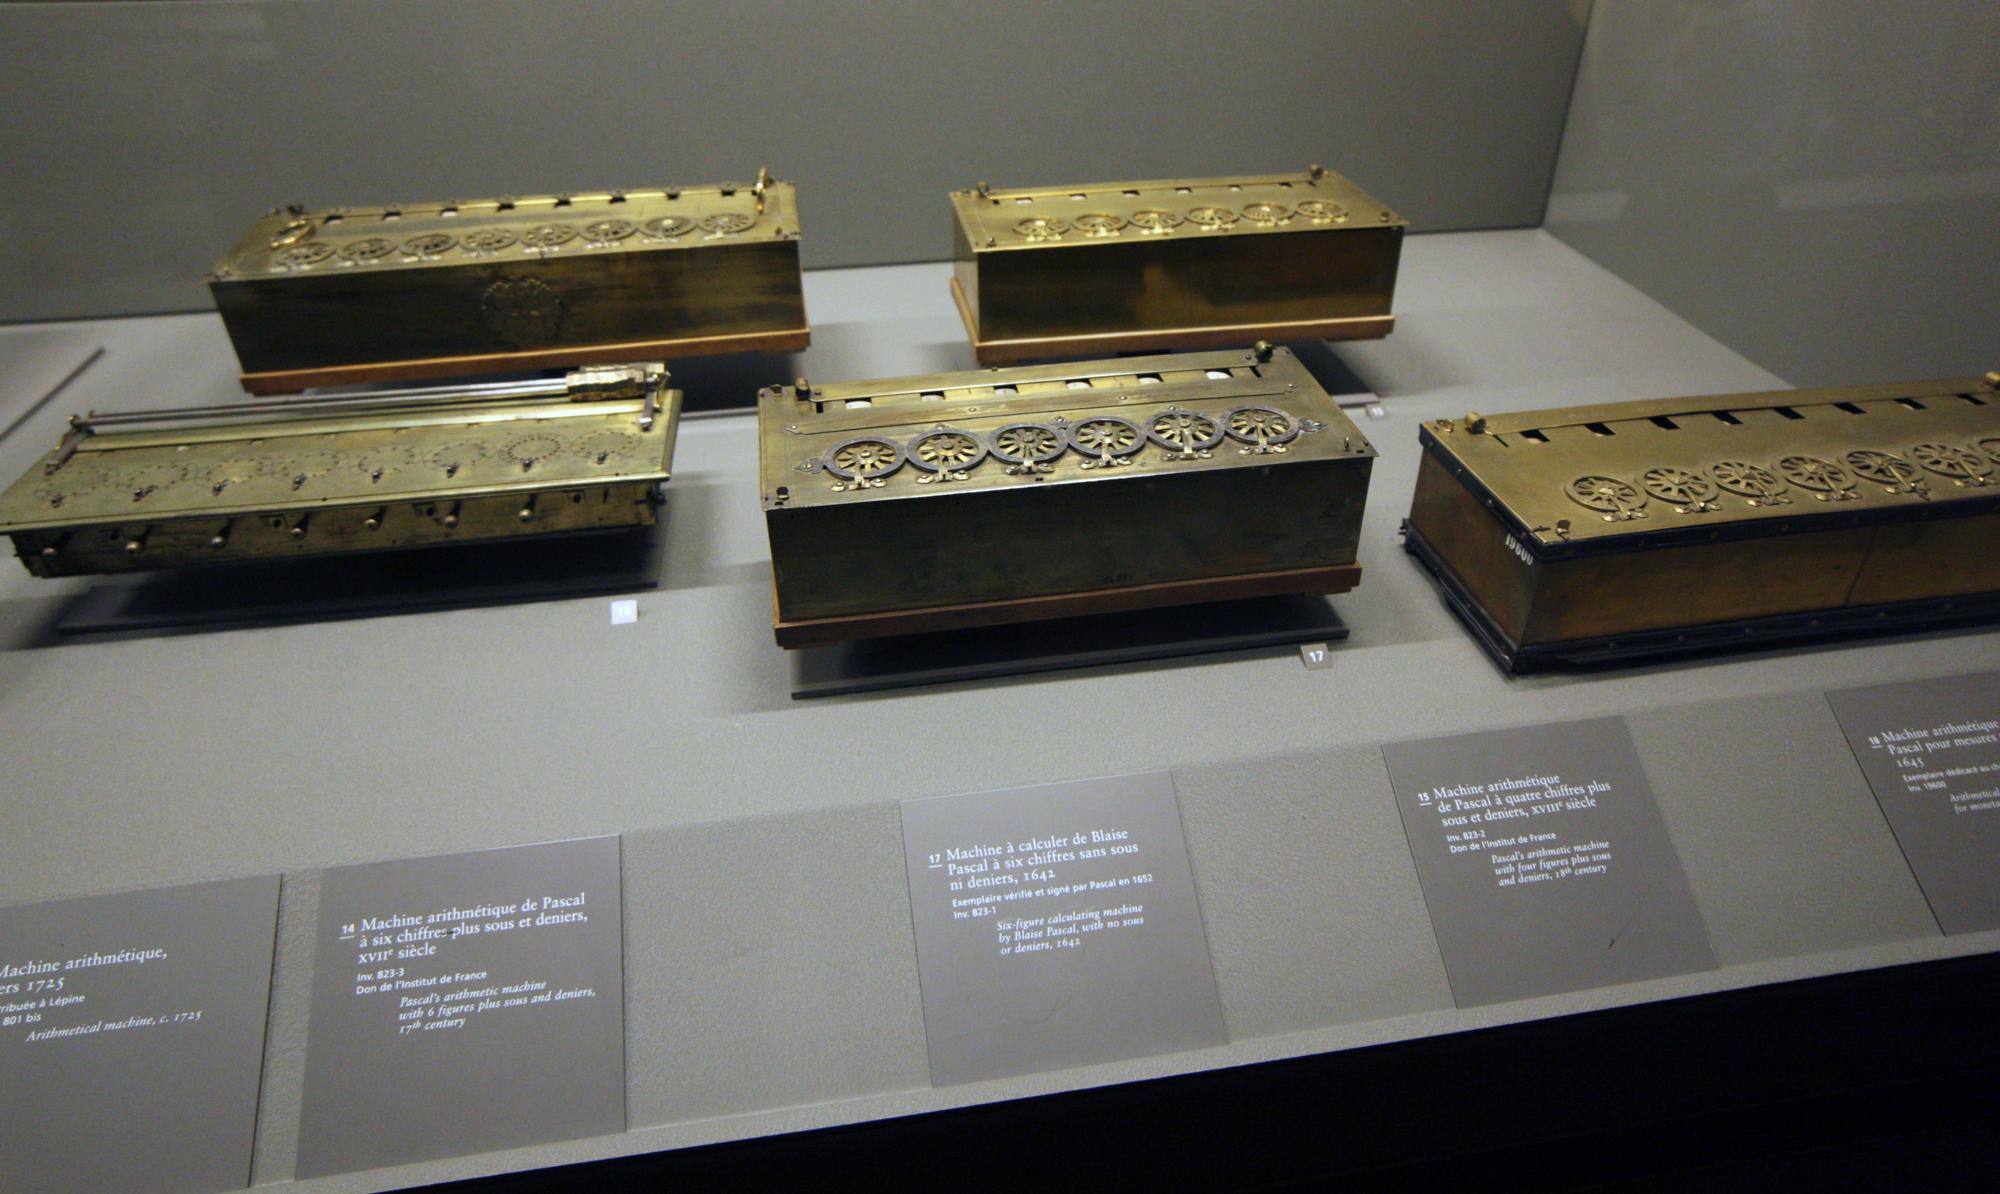 17th century mechanical calculators